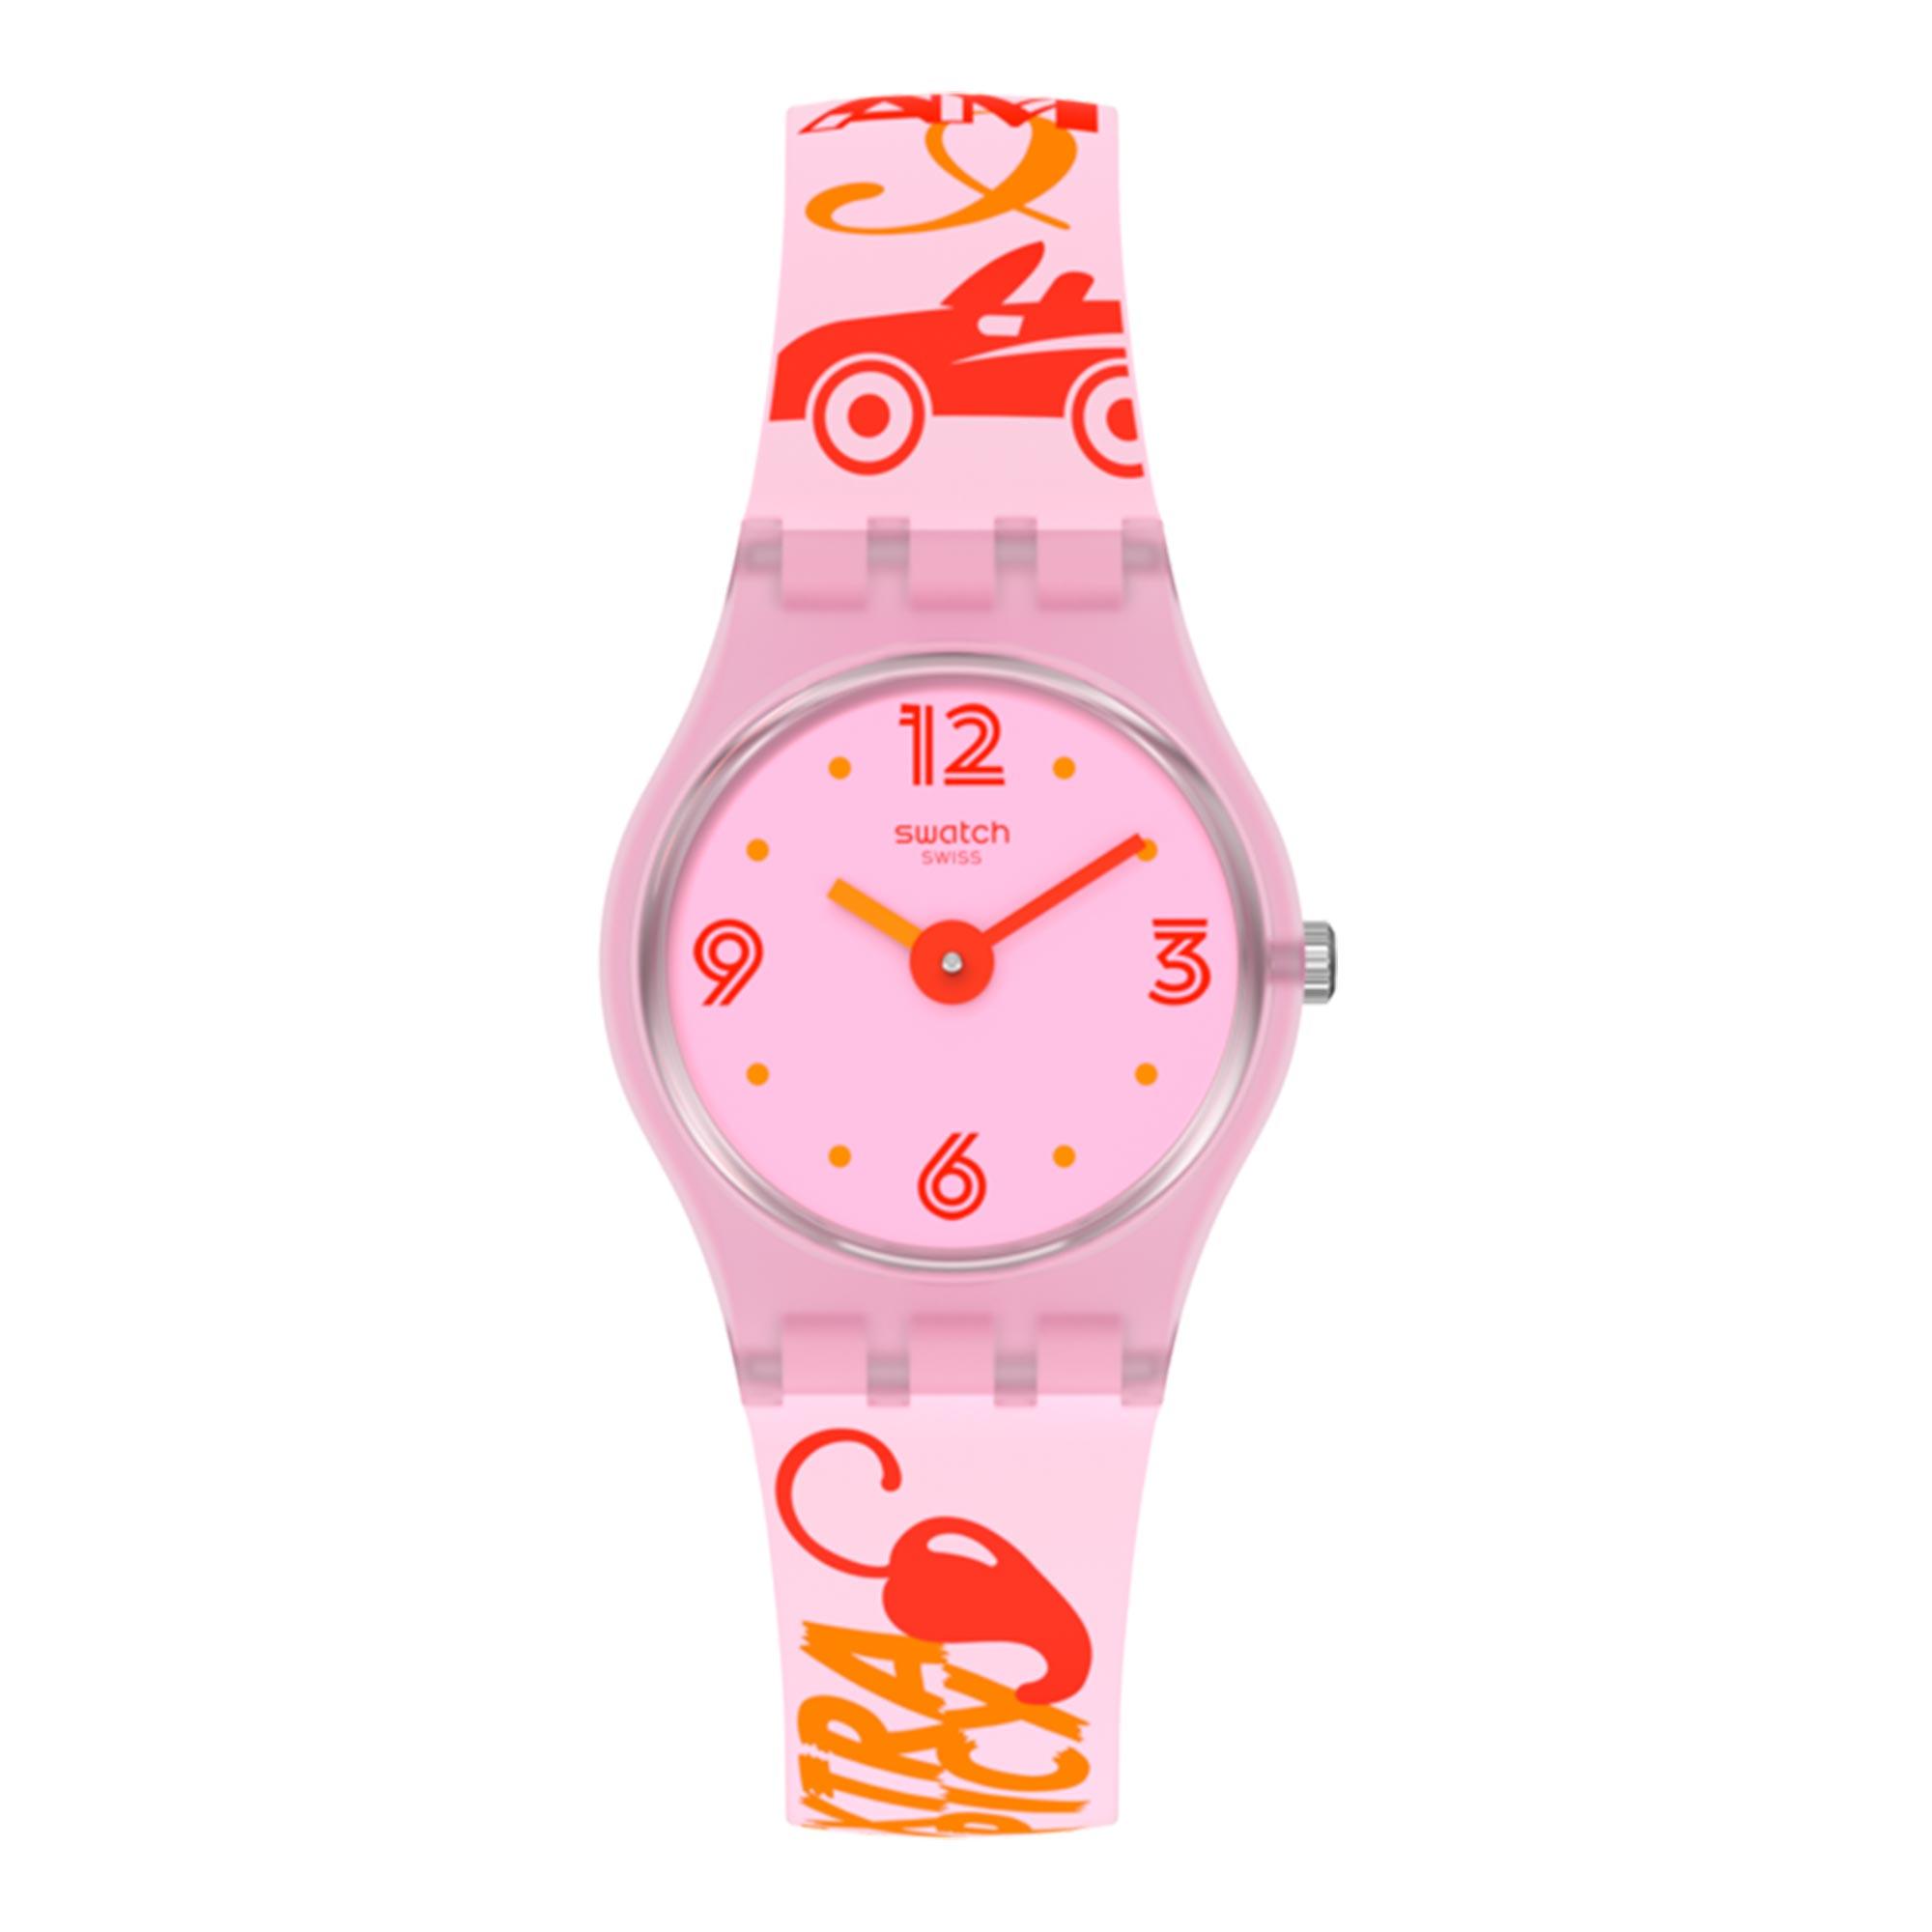 Swatch Original Lady Quartz Pink Dial Silicone Strap Ladies Watch LP164